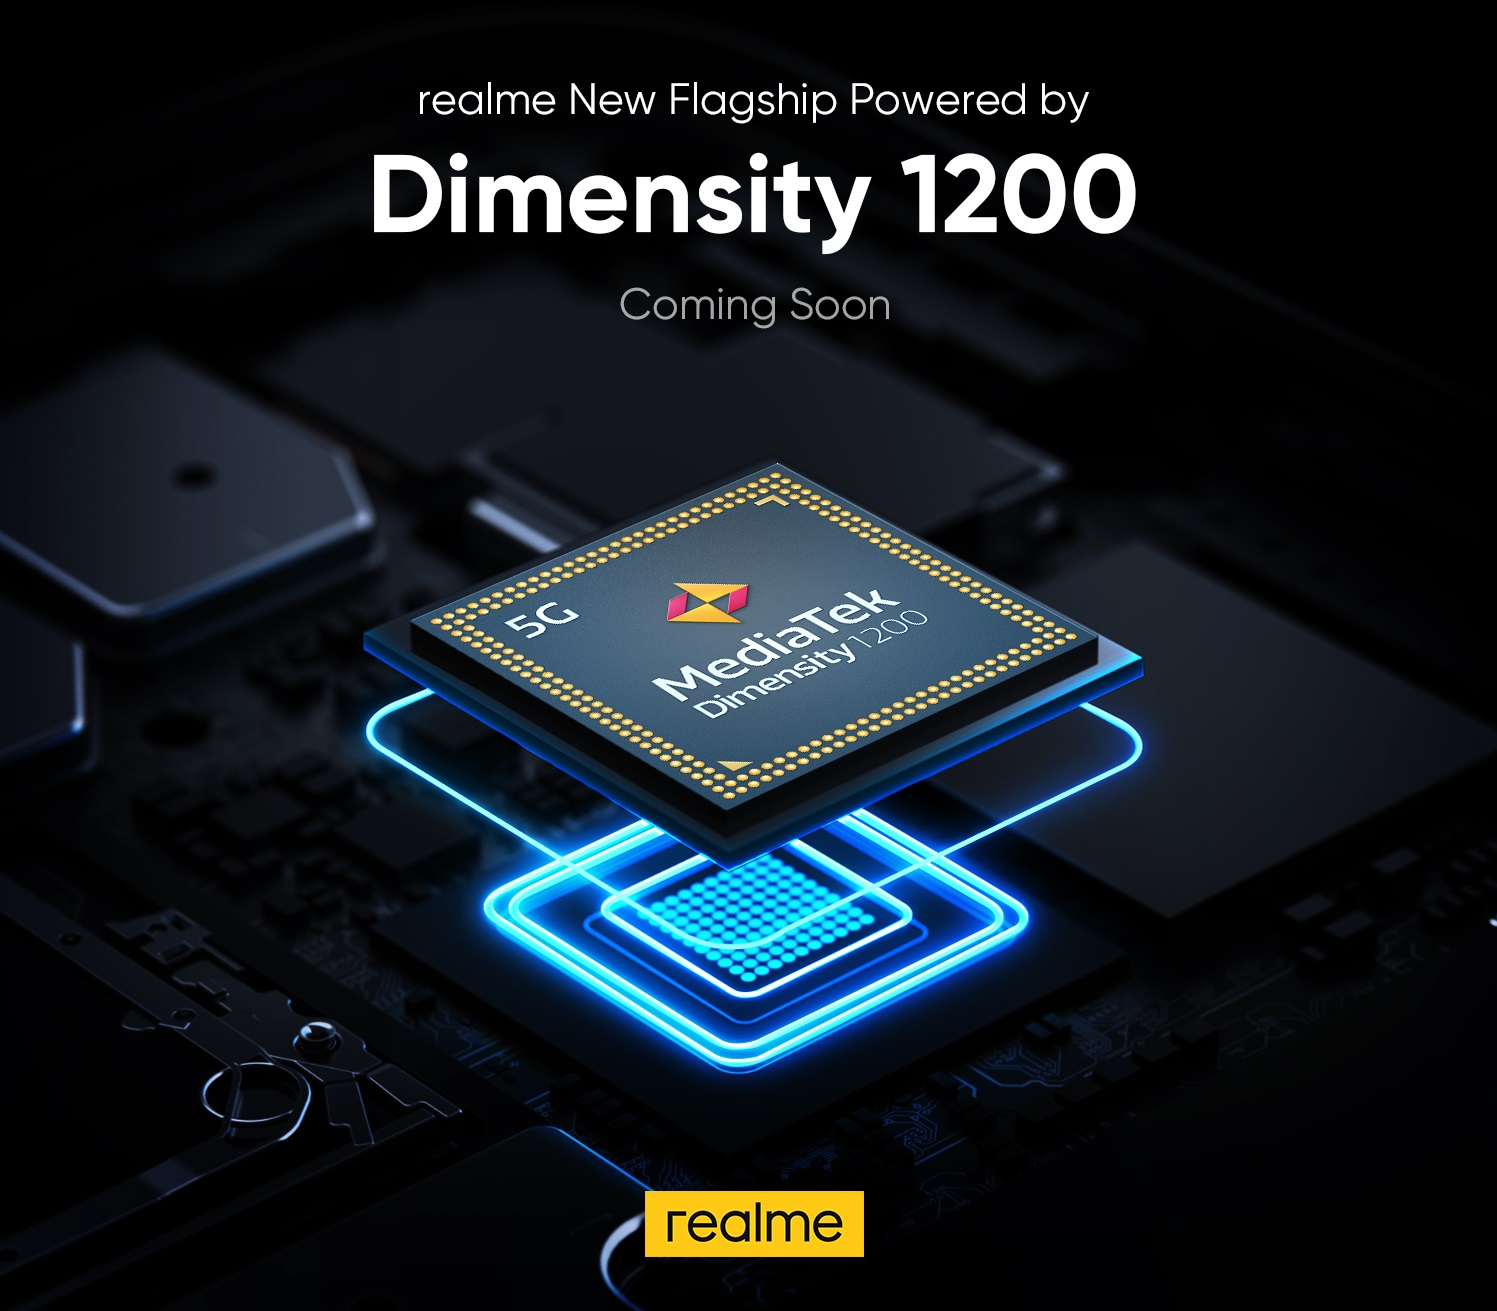 Dimensity-1200